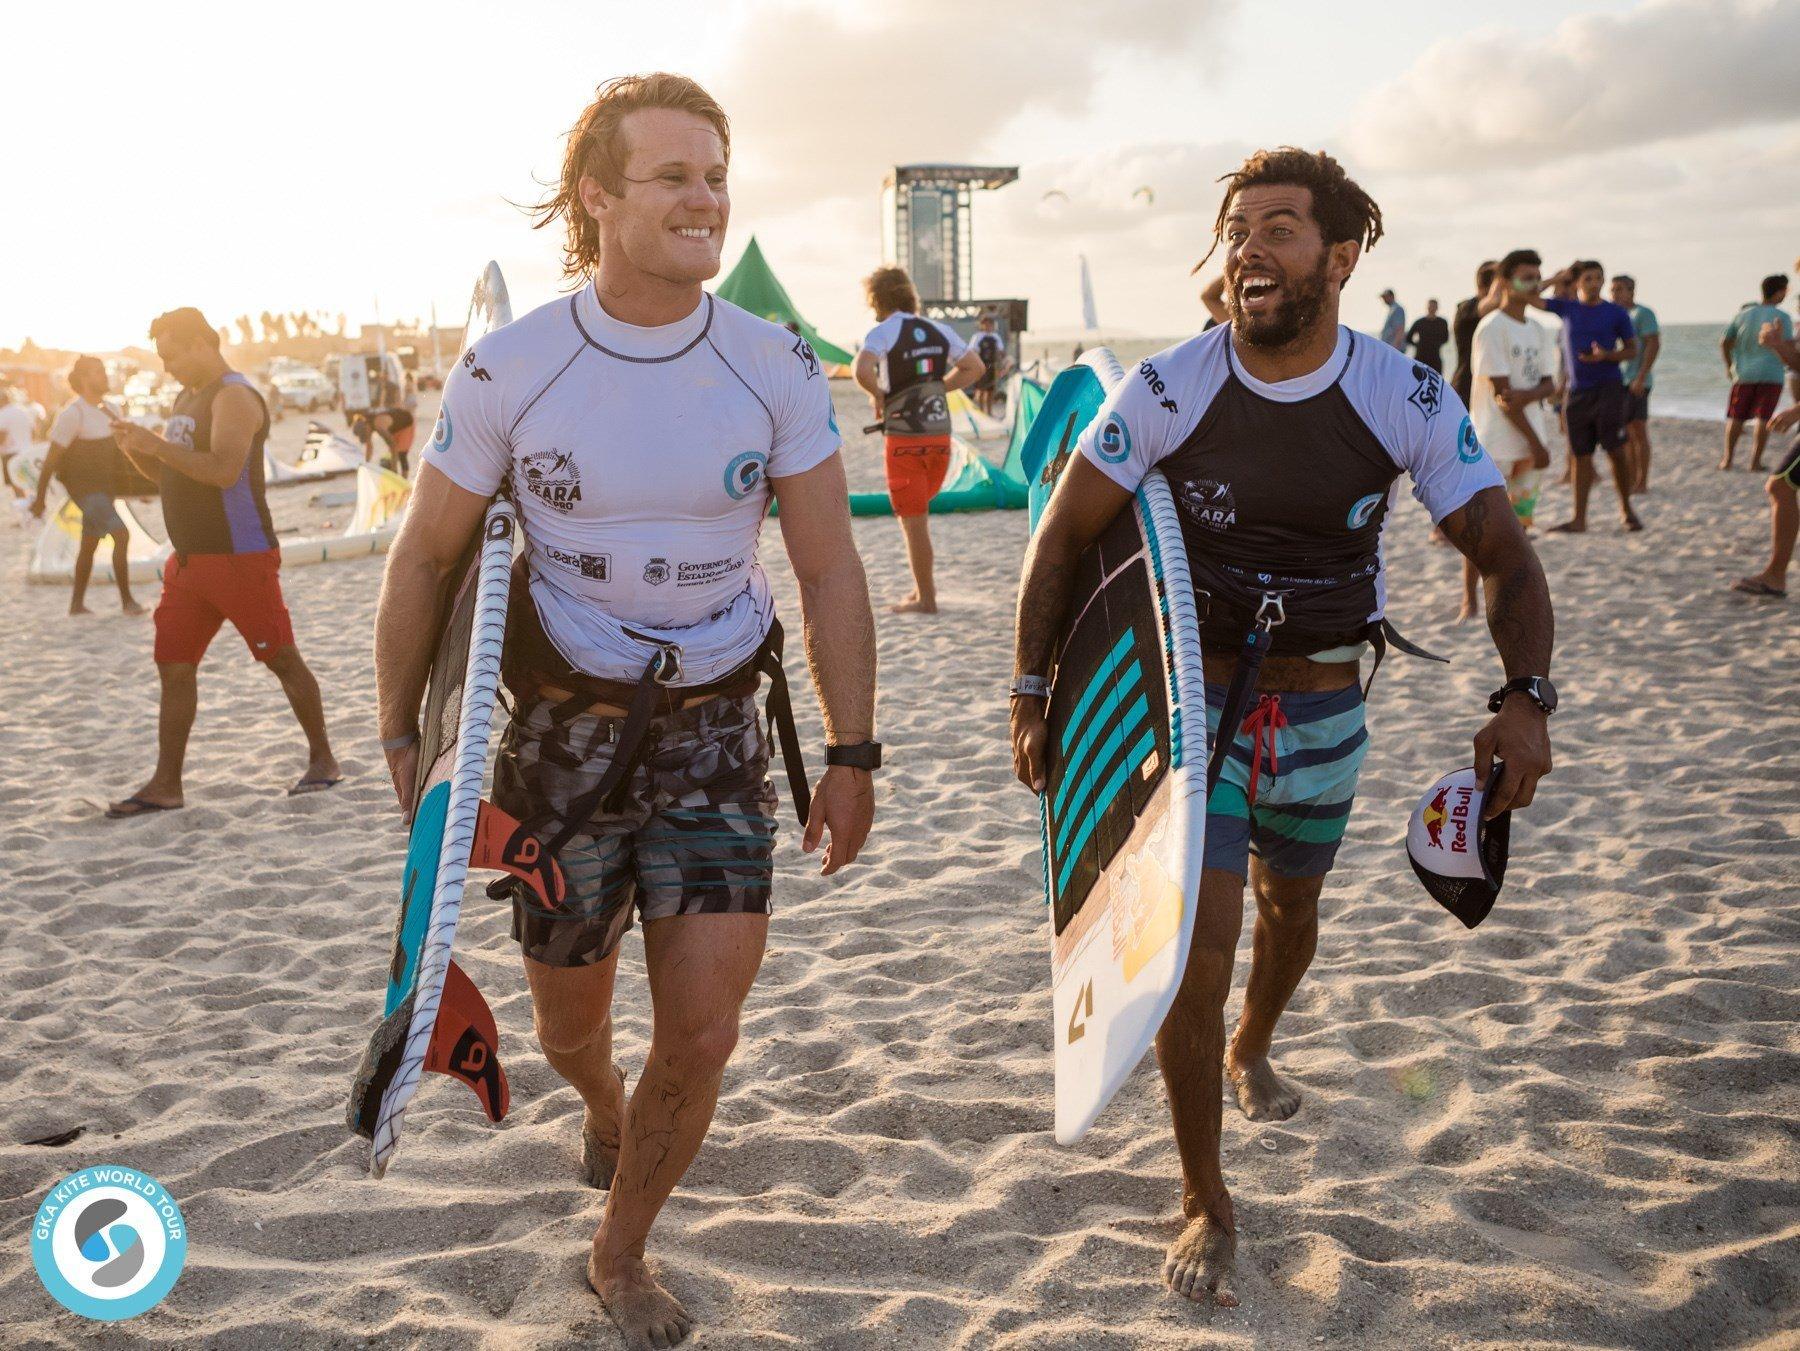 Campionato Mondiale GKA Kite Surf Brasile 2019- Eliminazione Singola Uomini